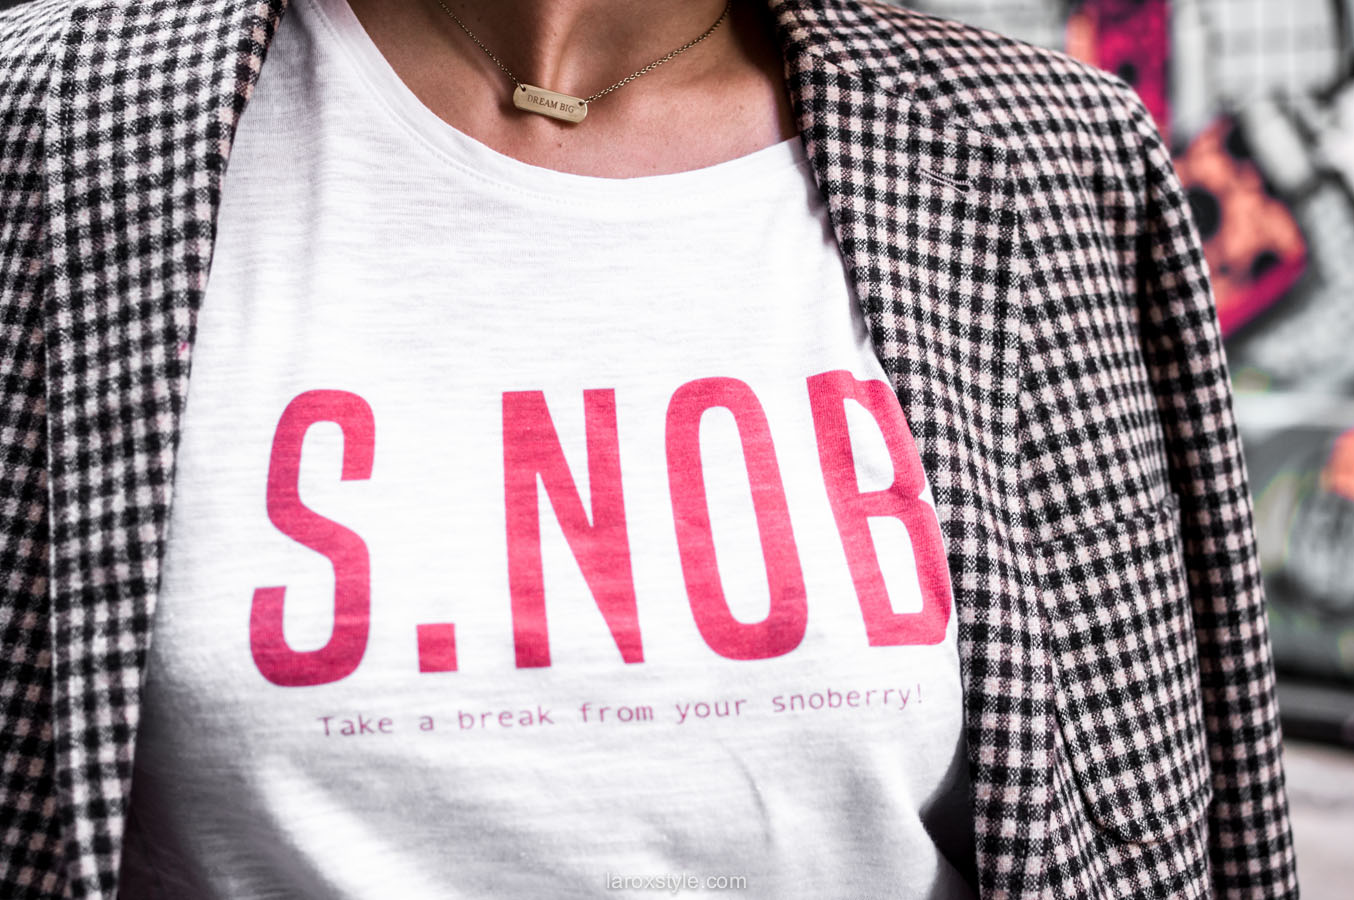 costume femme - tendance costume - t shirt message leonor roversi - SNOB - laroxstyle-7